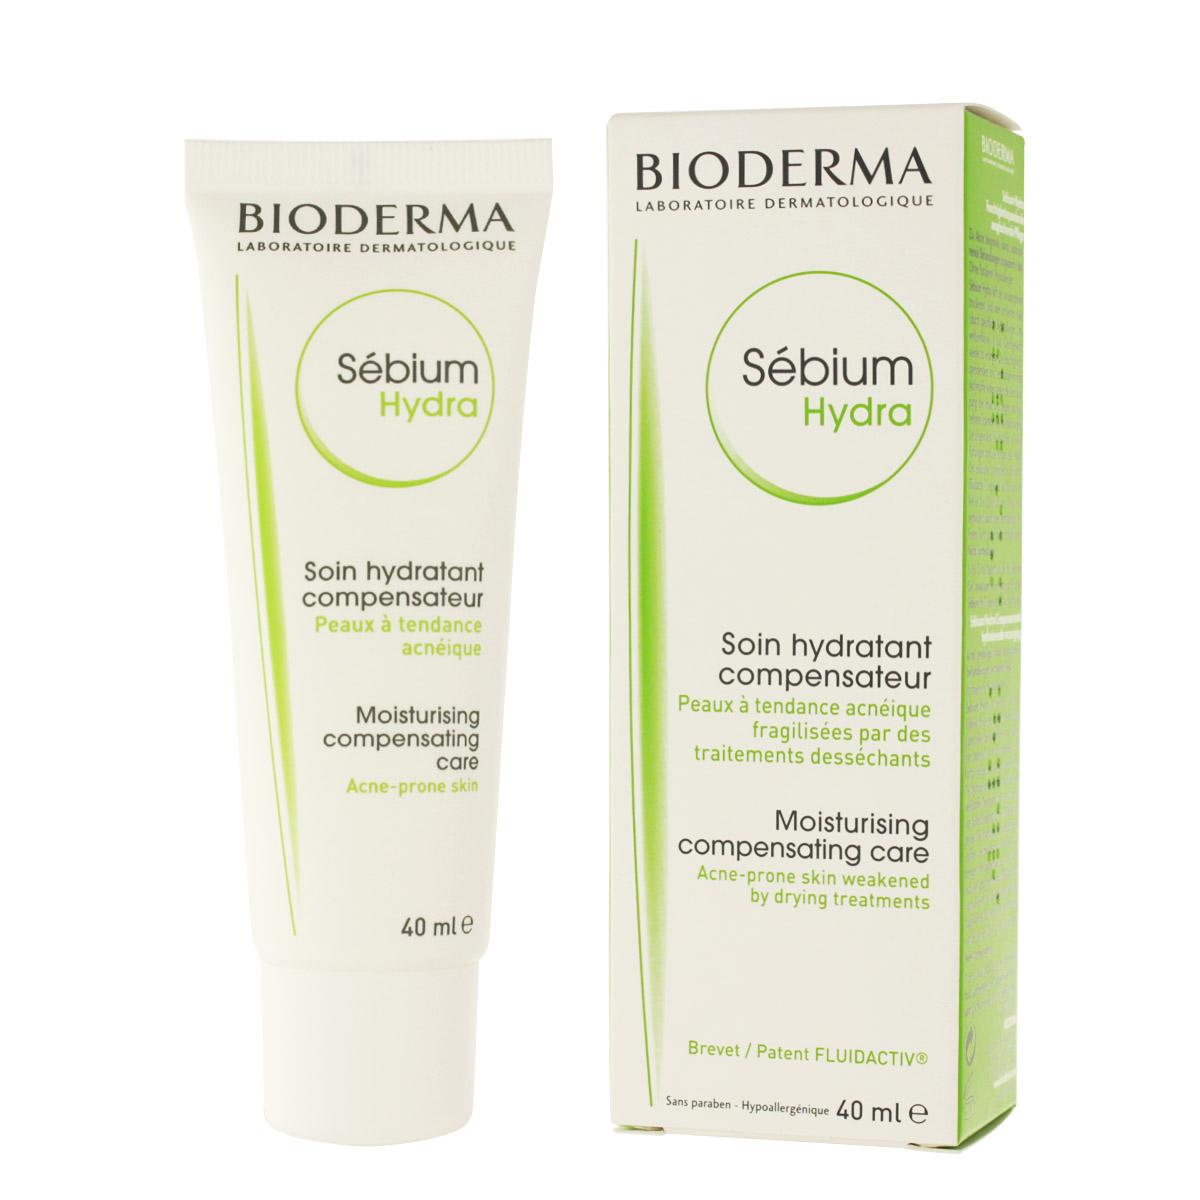 Bioderma Sébium Hydra Moisturising Compensating Care 40 ml